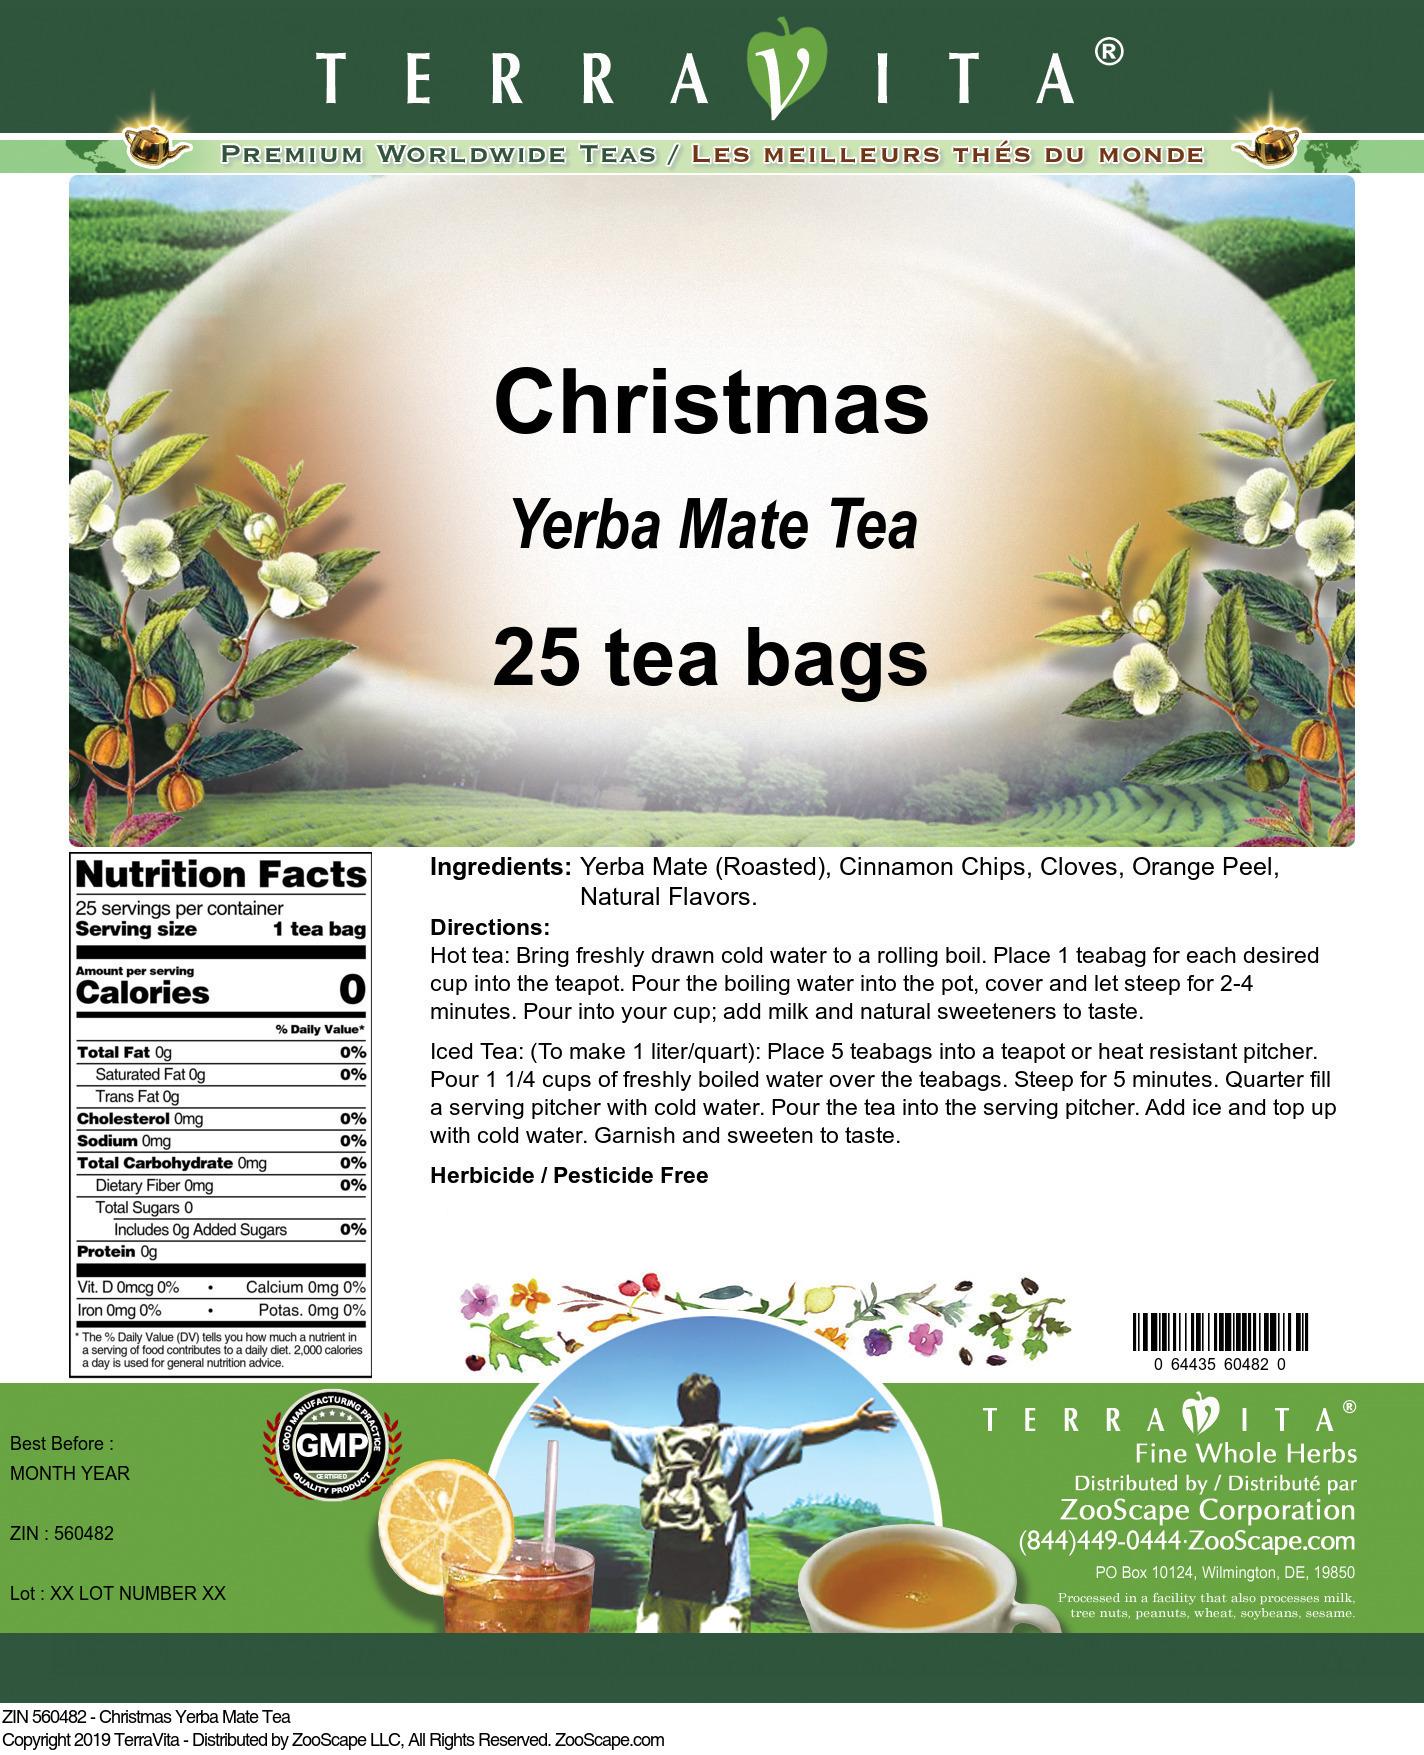 Christmas Yerba Mate Tea